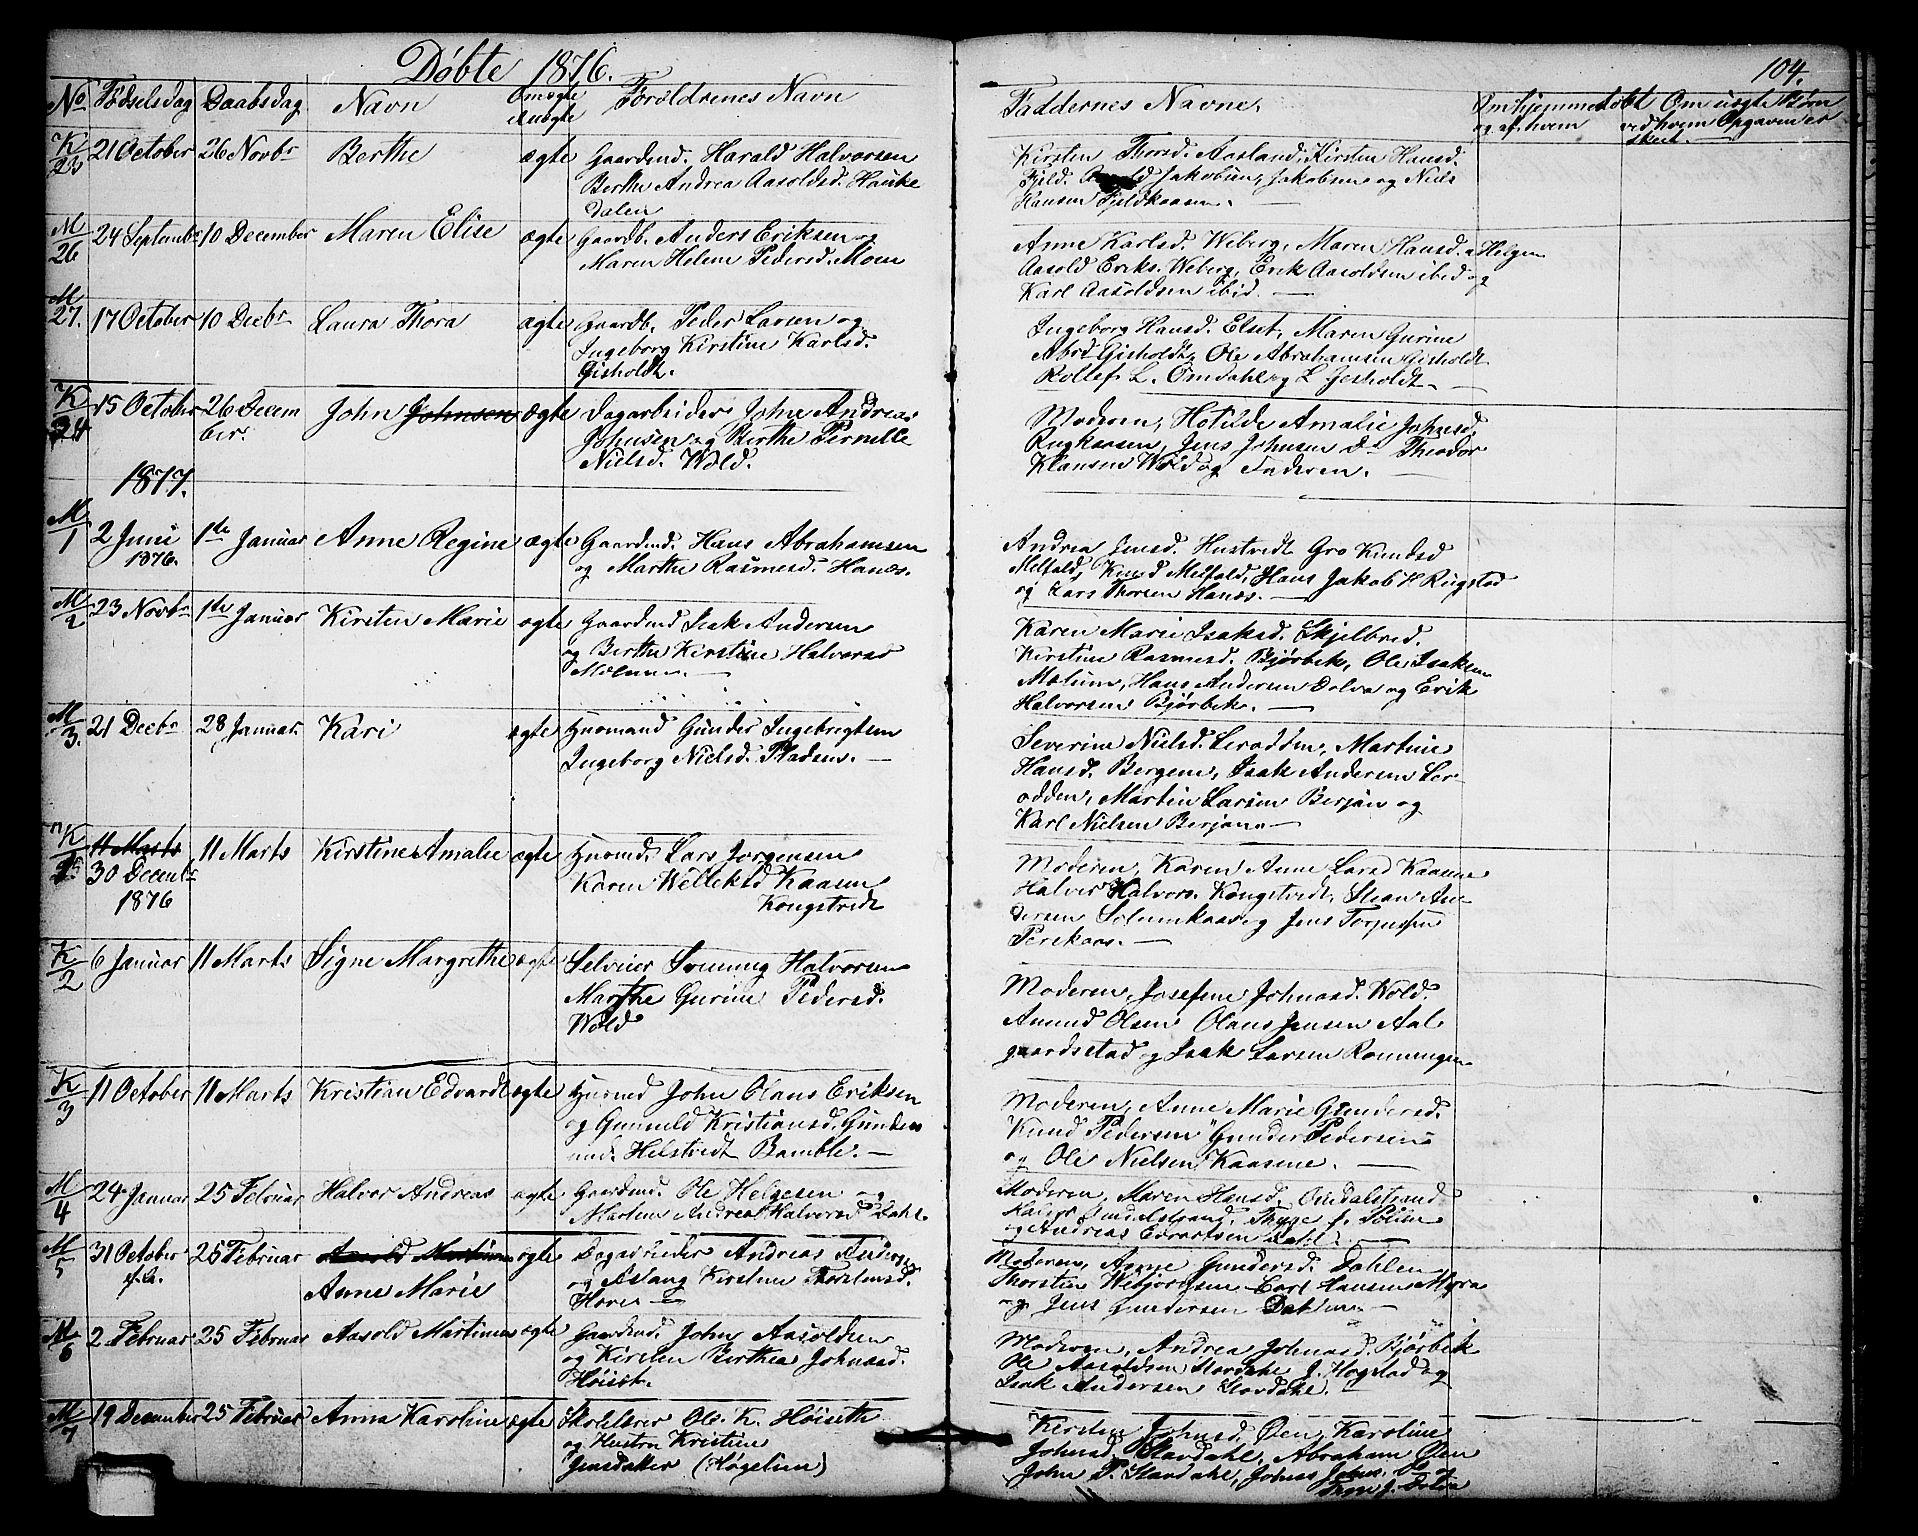 SAKO, Solum kirkebøker, G/Gb/L0002: Klokkerbok nr. II 2, 1859-1879, s. 104